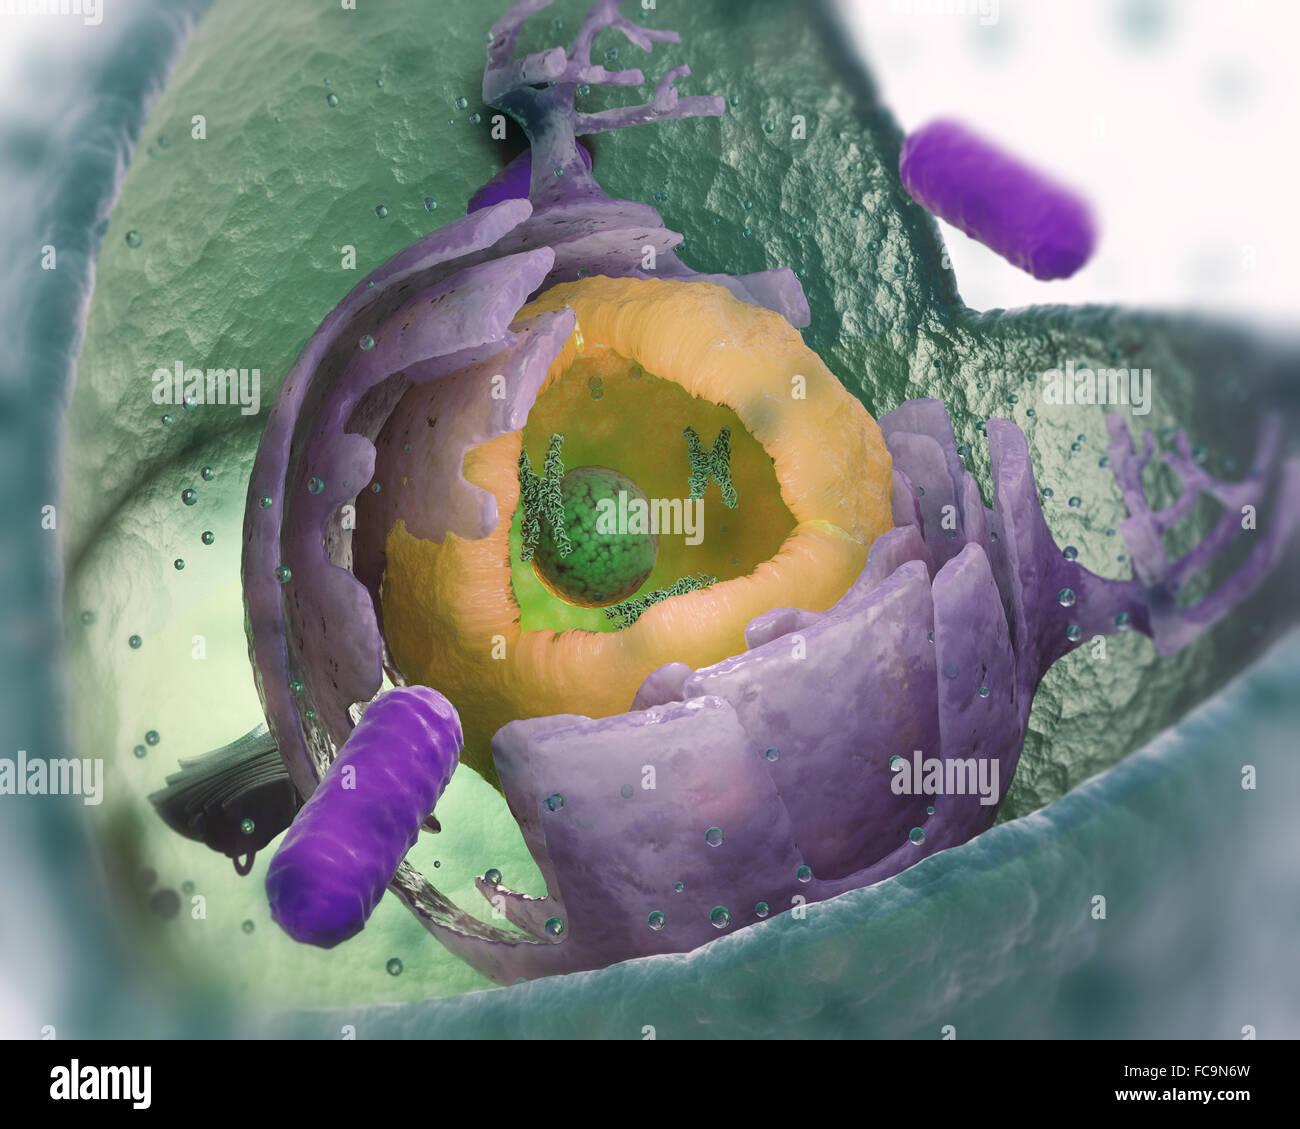 Eukaryotic Zelle Struktur Cut-away - wissenschaftlich exakte 3d illustration Stockbild